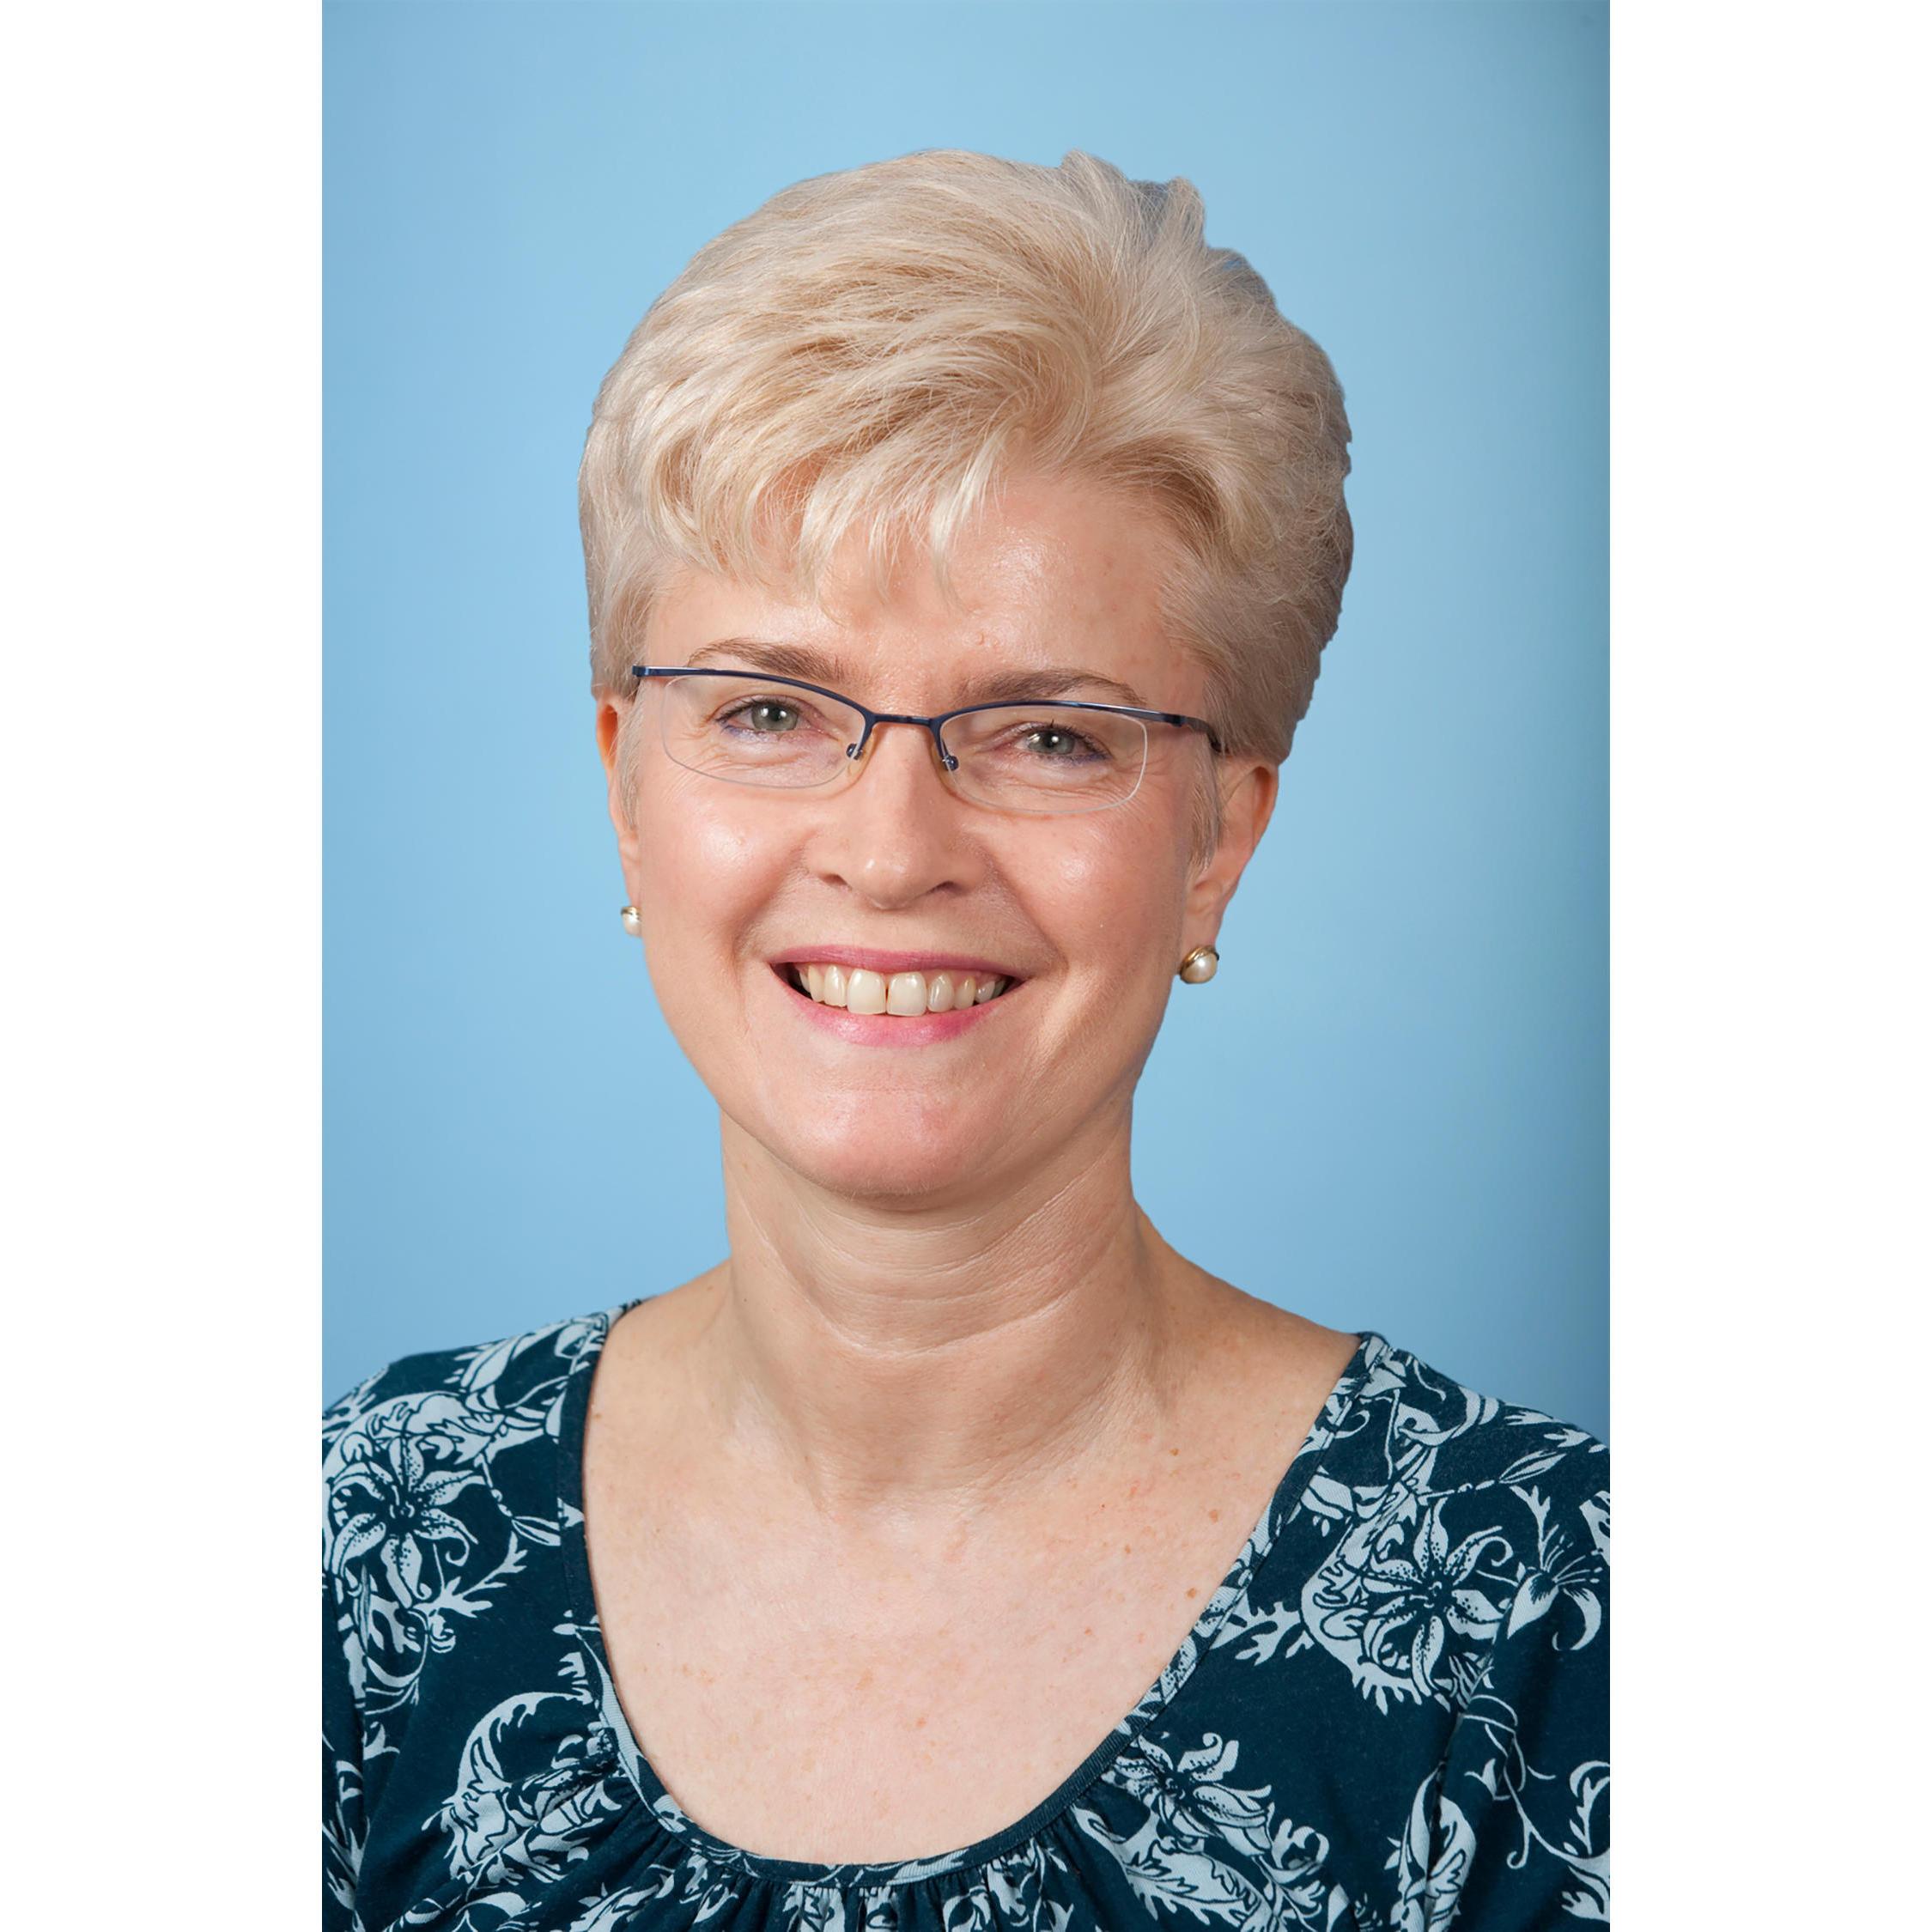 Bess T. Schoen, MD